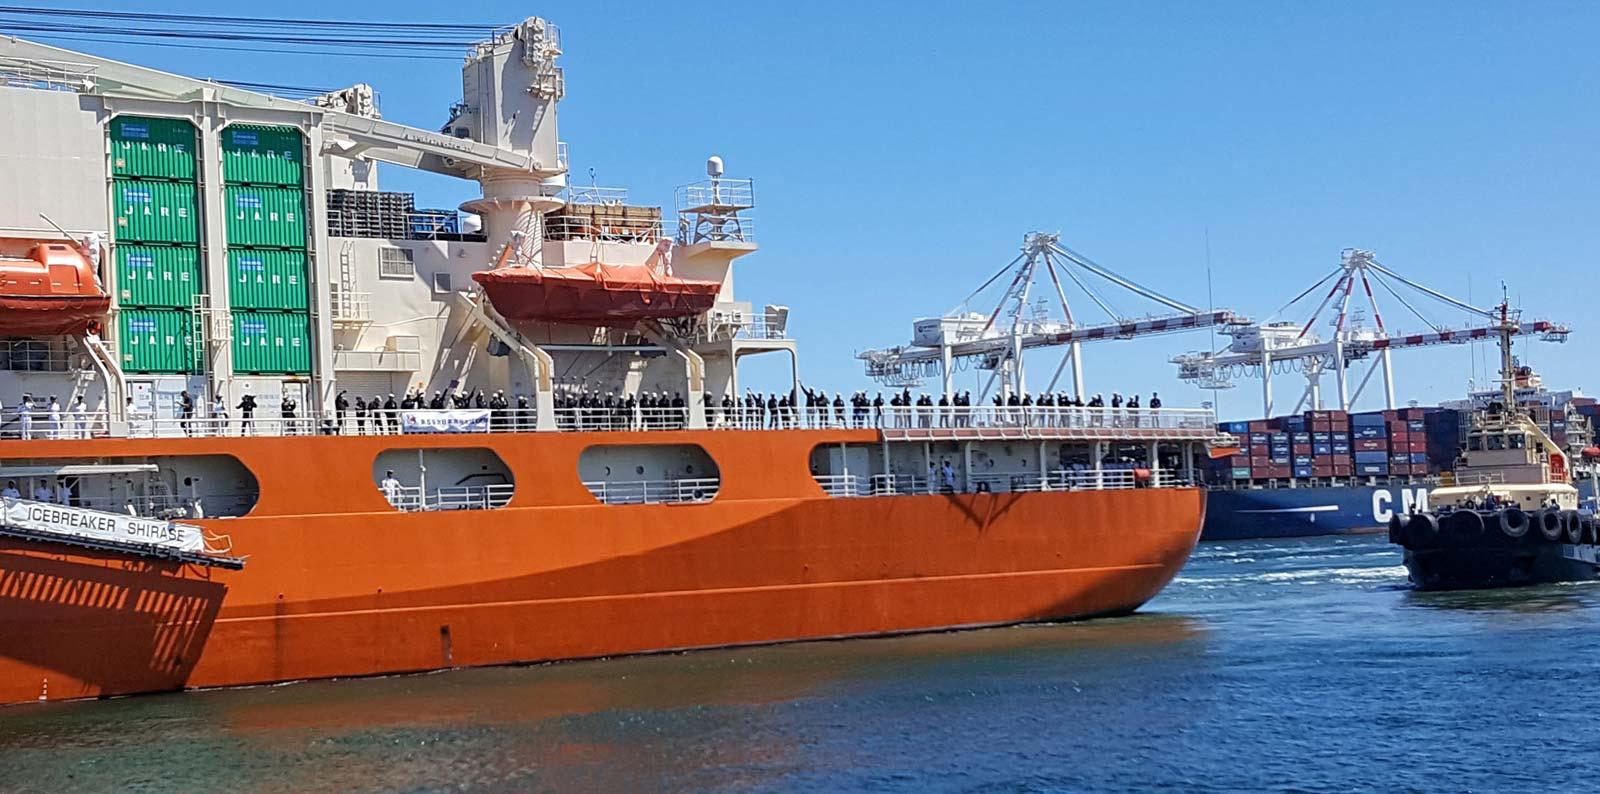 shirase-ship-japanese-icebreaker-fremantle-3